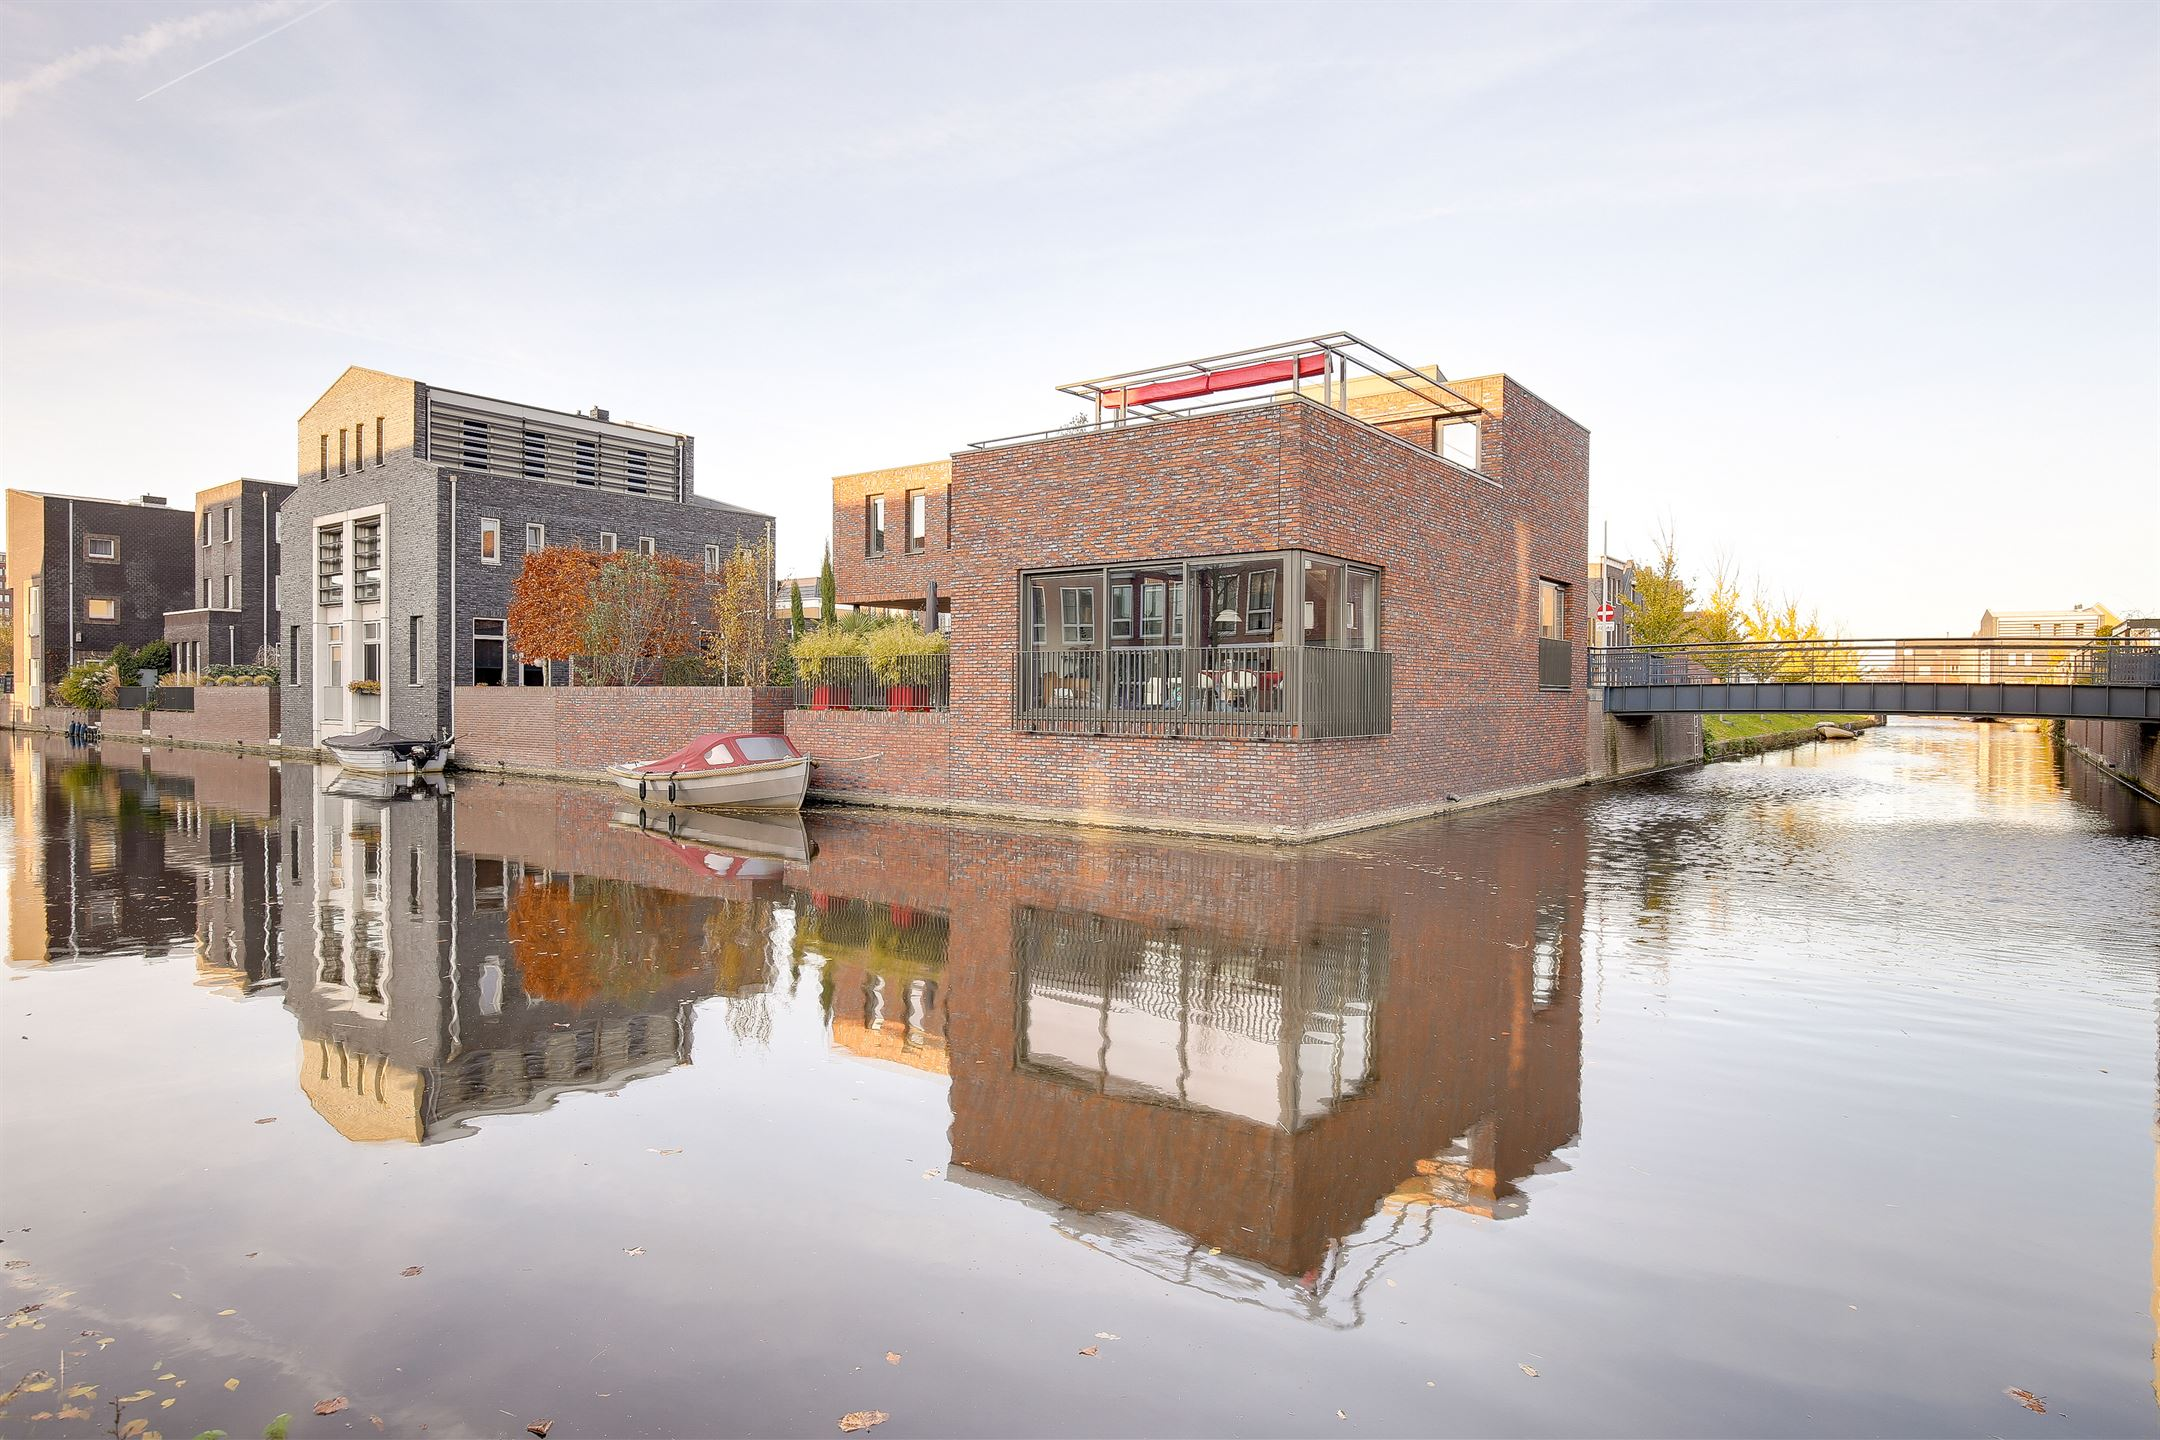 verkocht schoklandstraat 63 3826 ck amersfoort funda